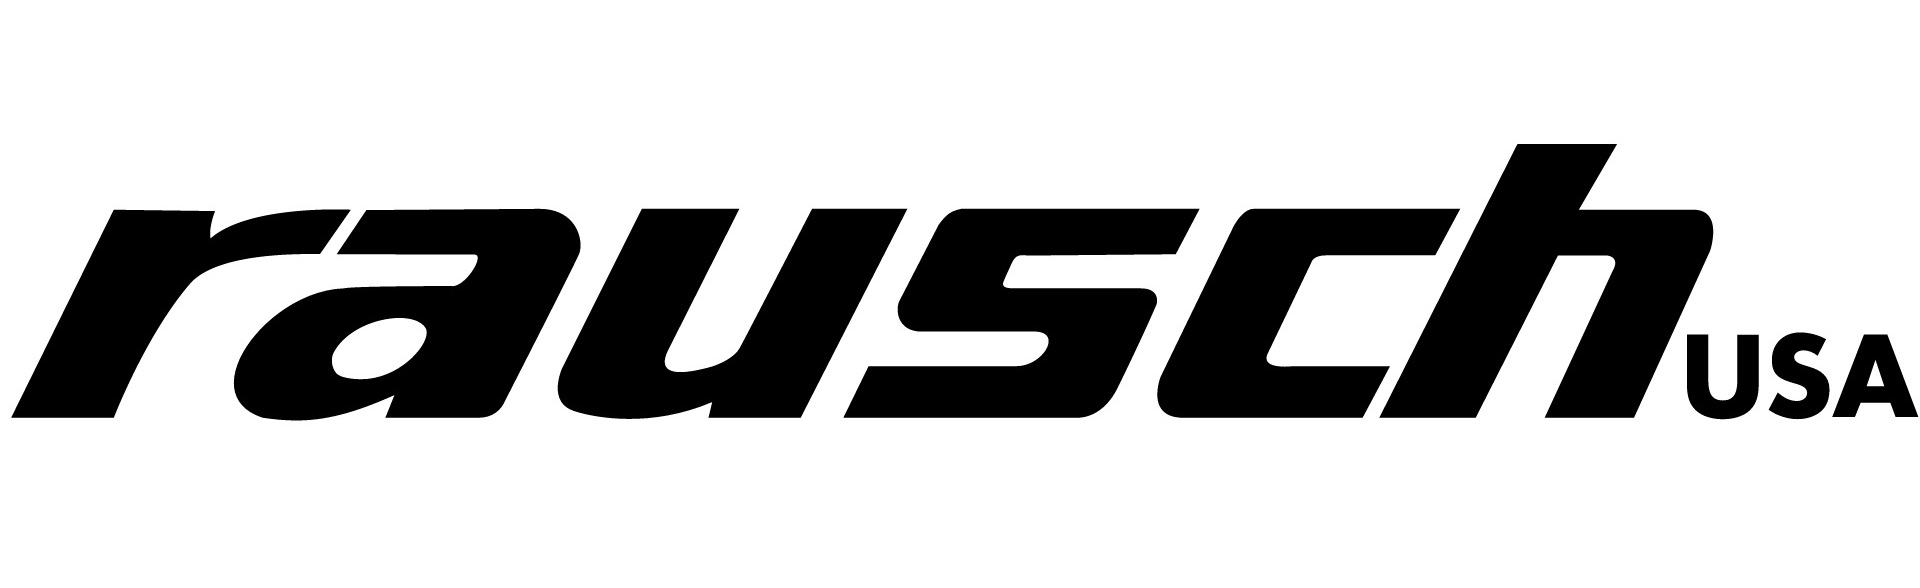 rauschusa_logo2.jpg